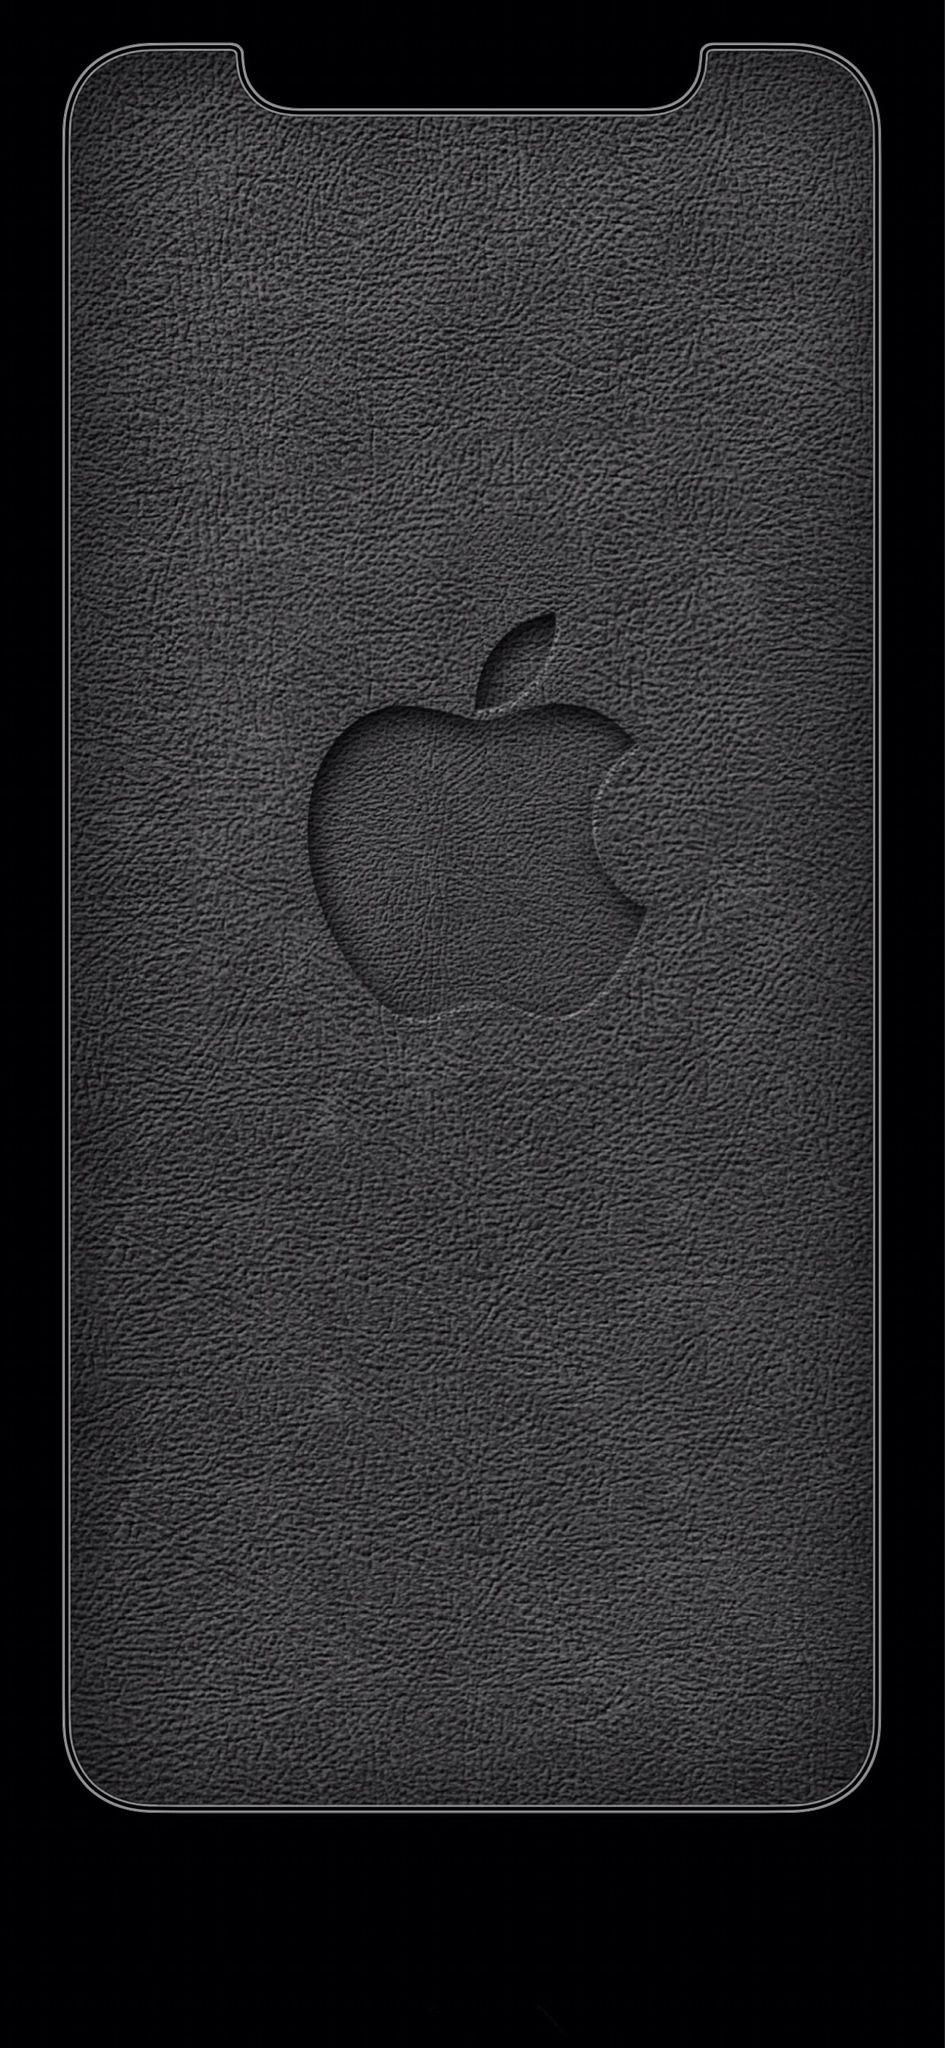 The Iphone X Xs Wallpaper Thread Page 40 Iphone Ipad Ipod